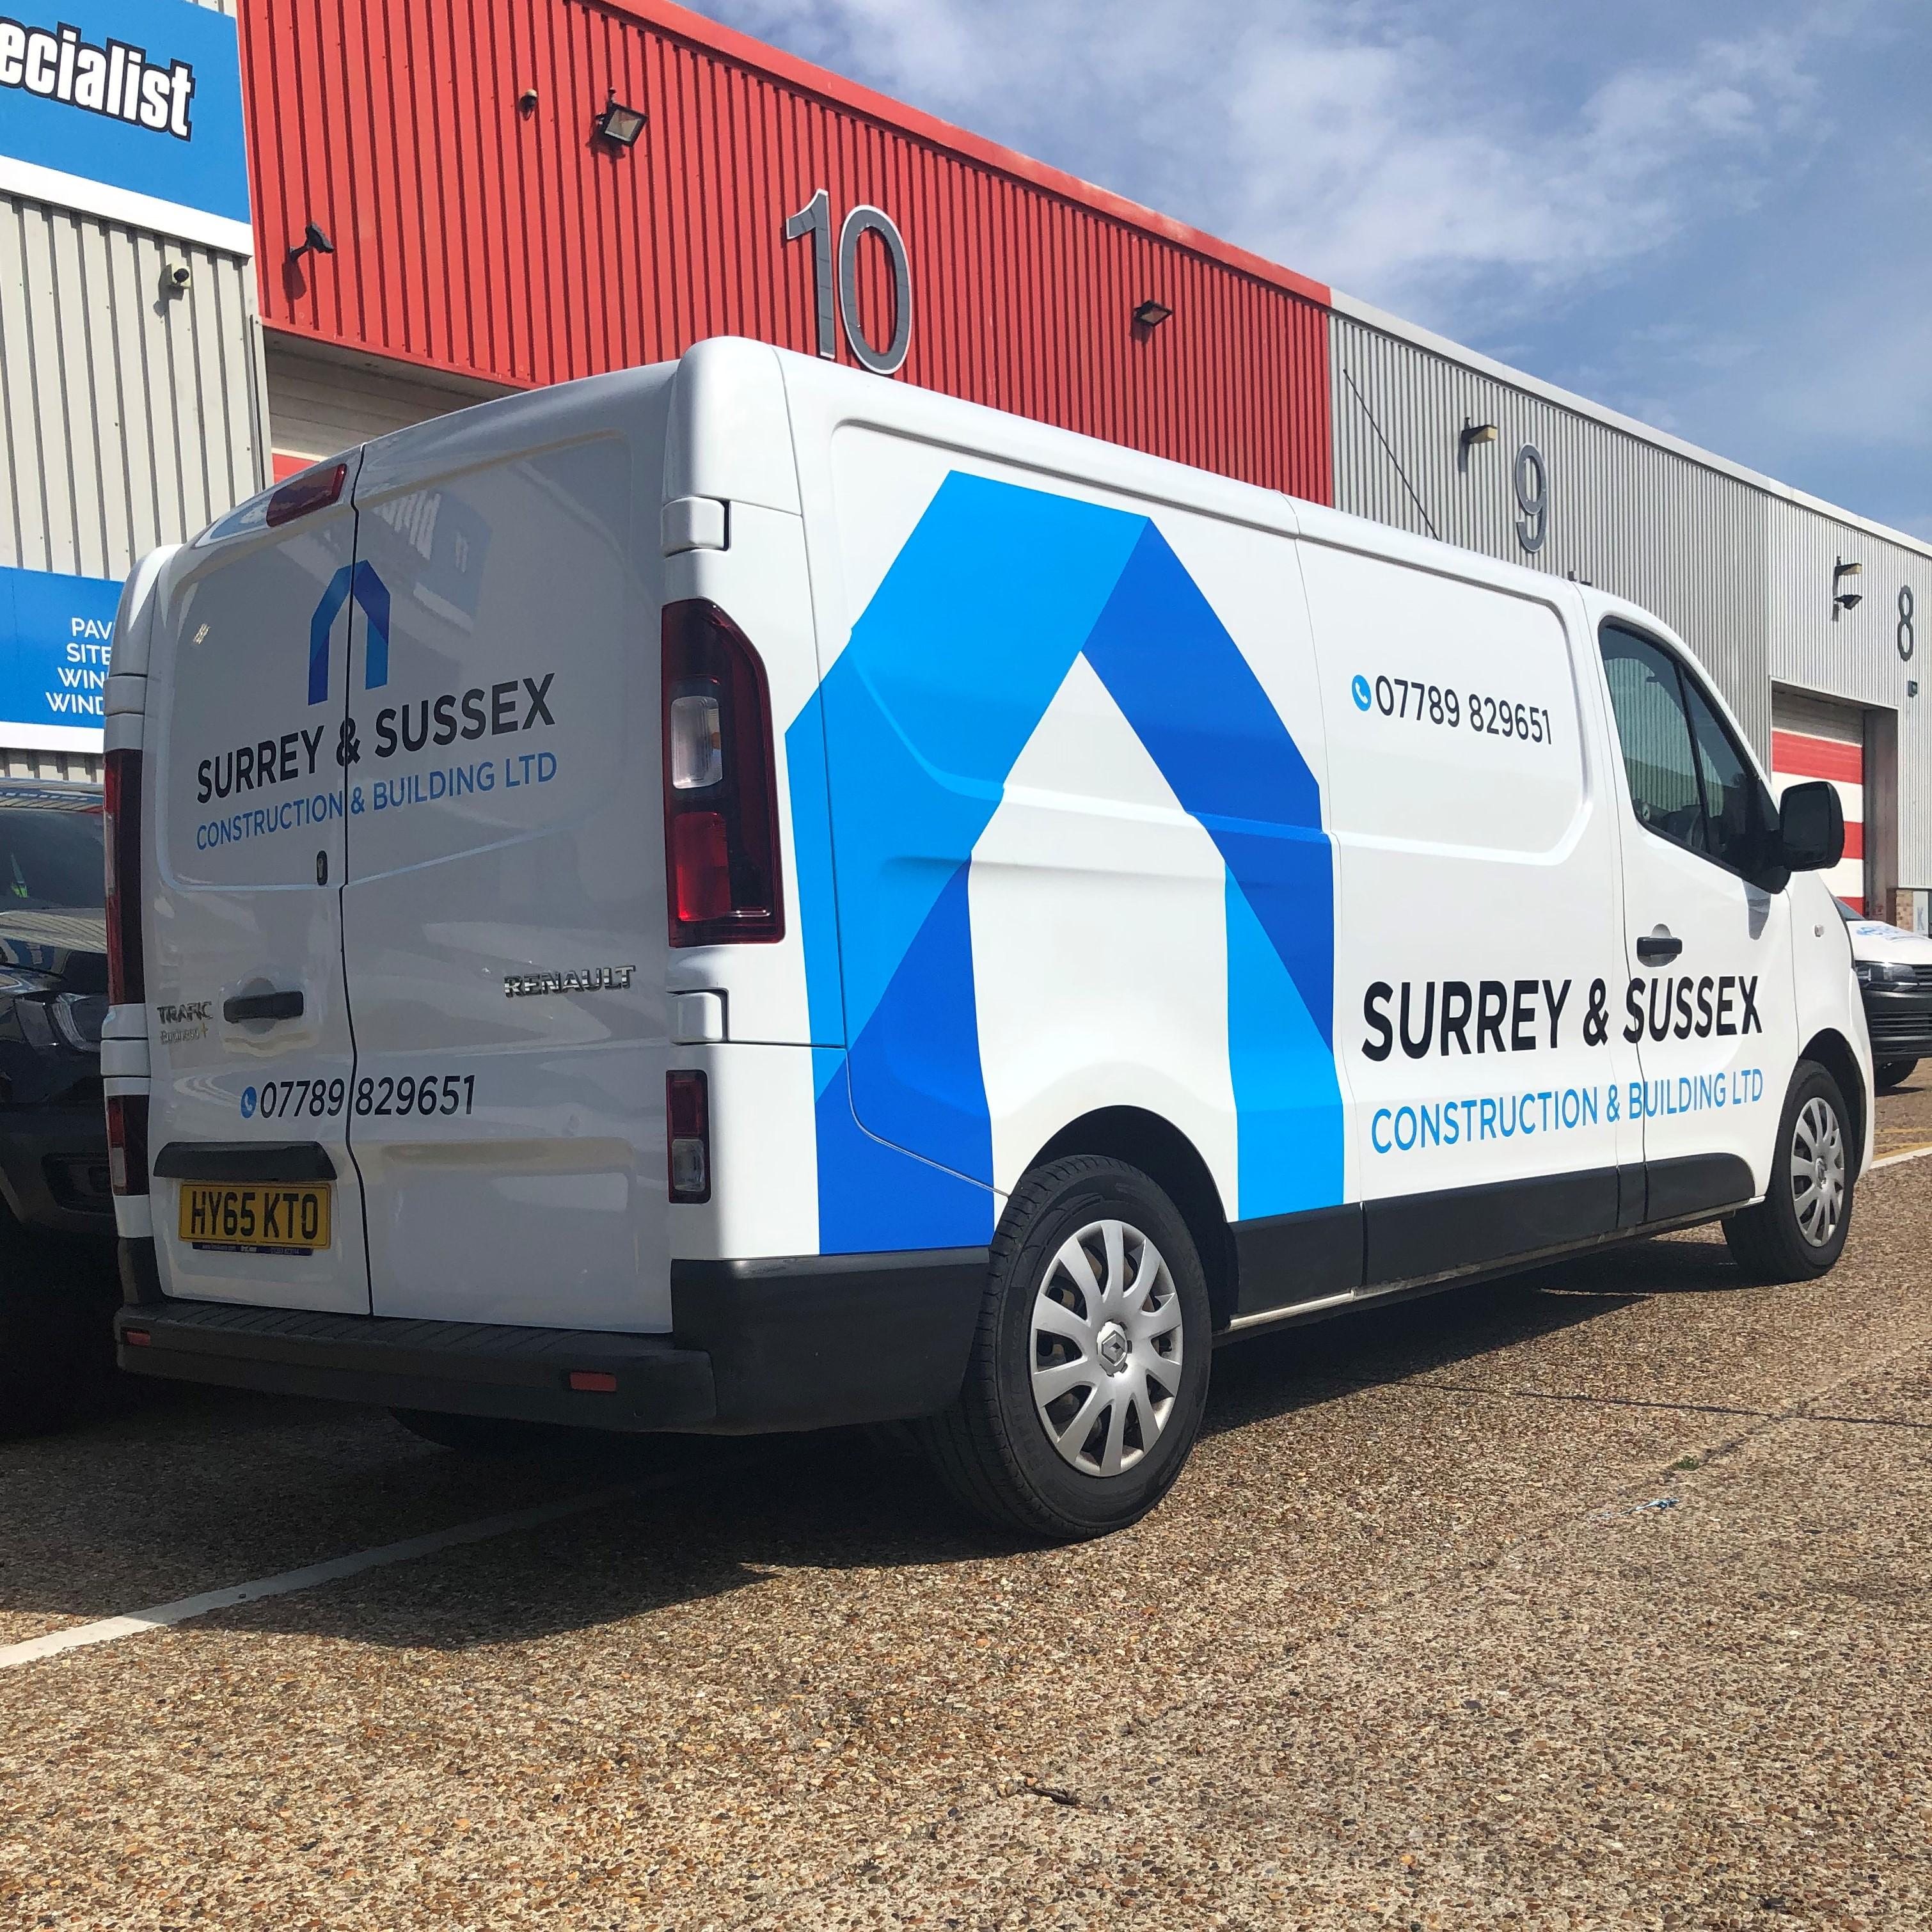 Surrey & Sussex Construction